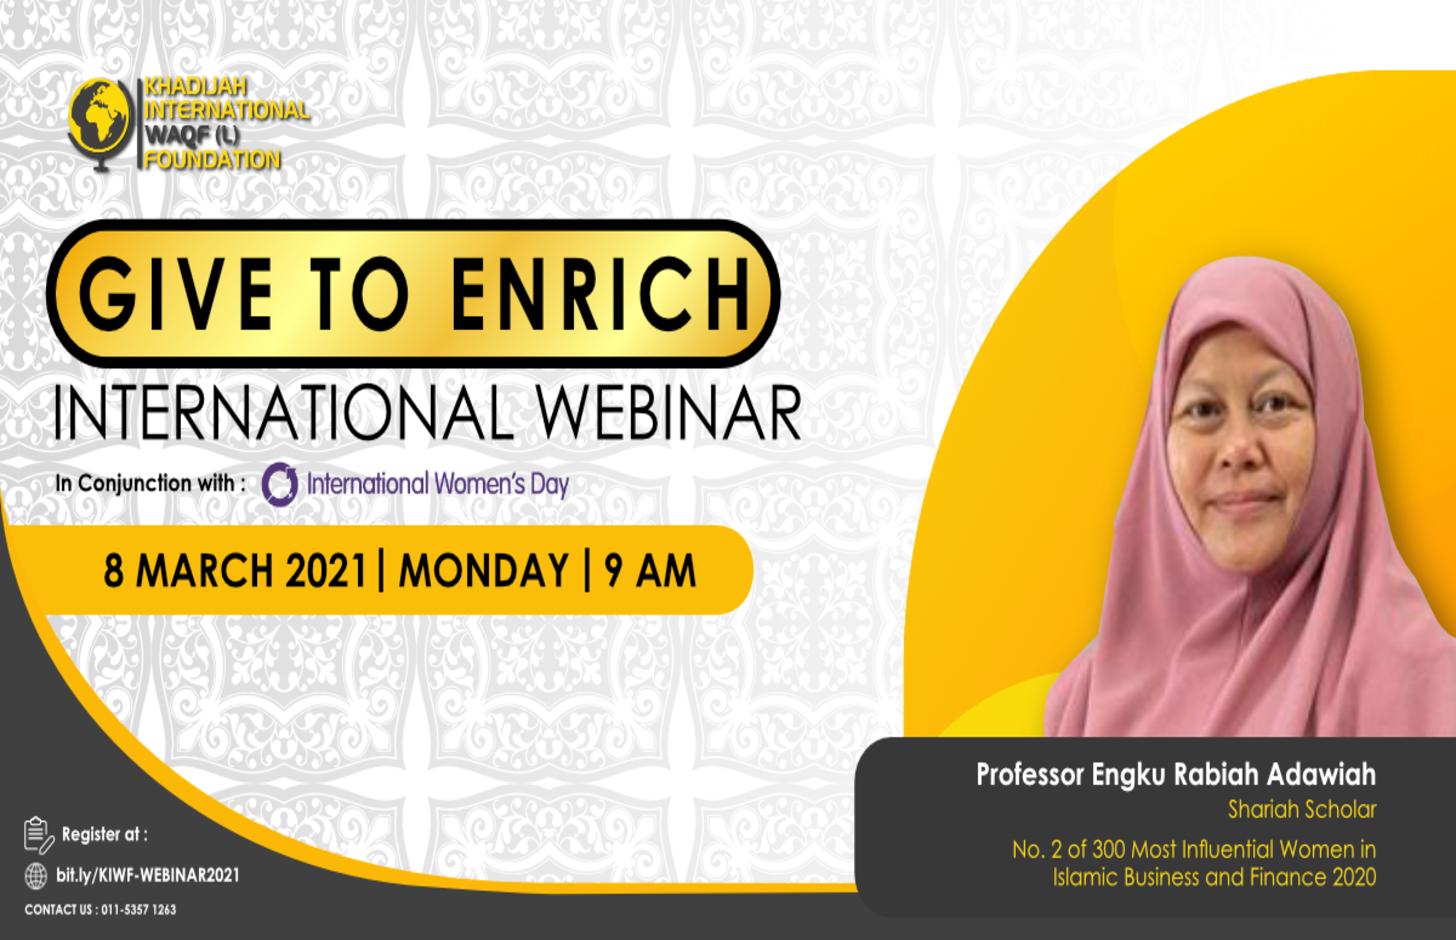 Professor Engku Rabiah Adawiah